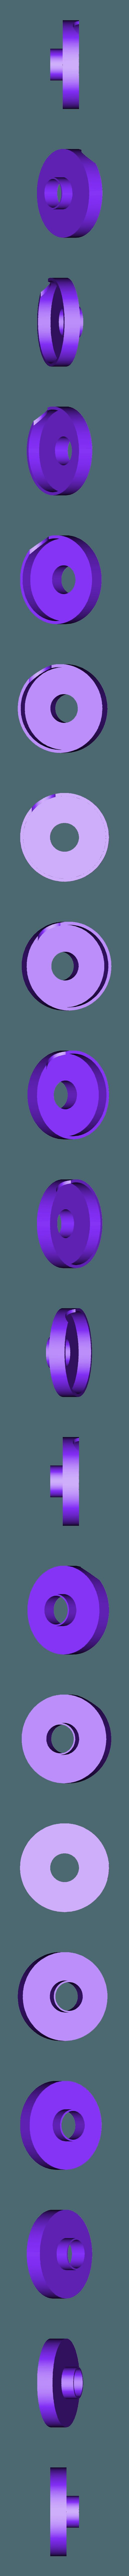 esimene_osa.stl Download free STL file Submersible water pump • 3D print template, LetsPrintYT